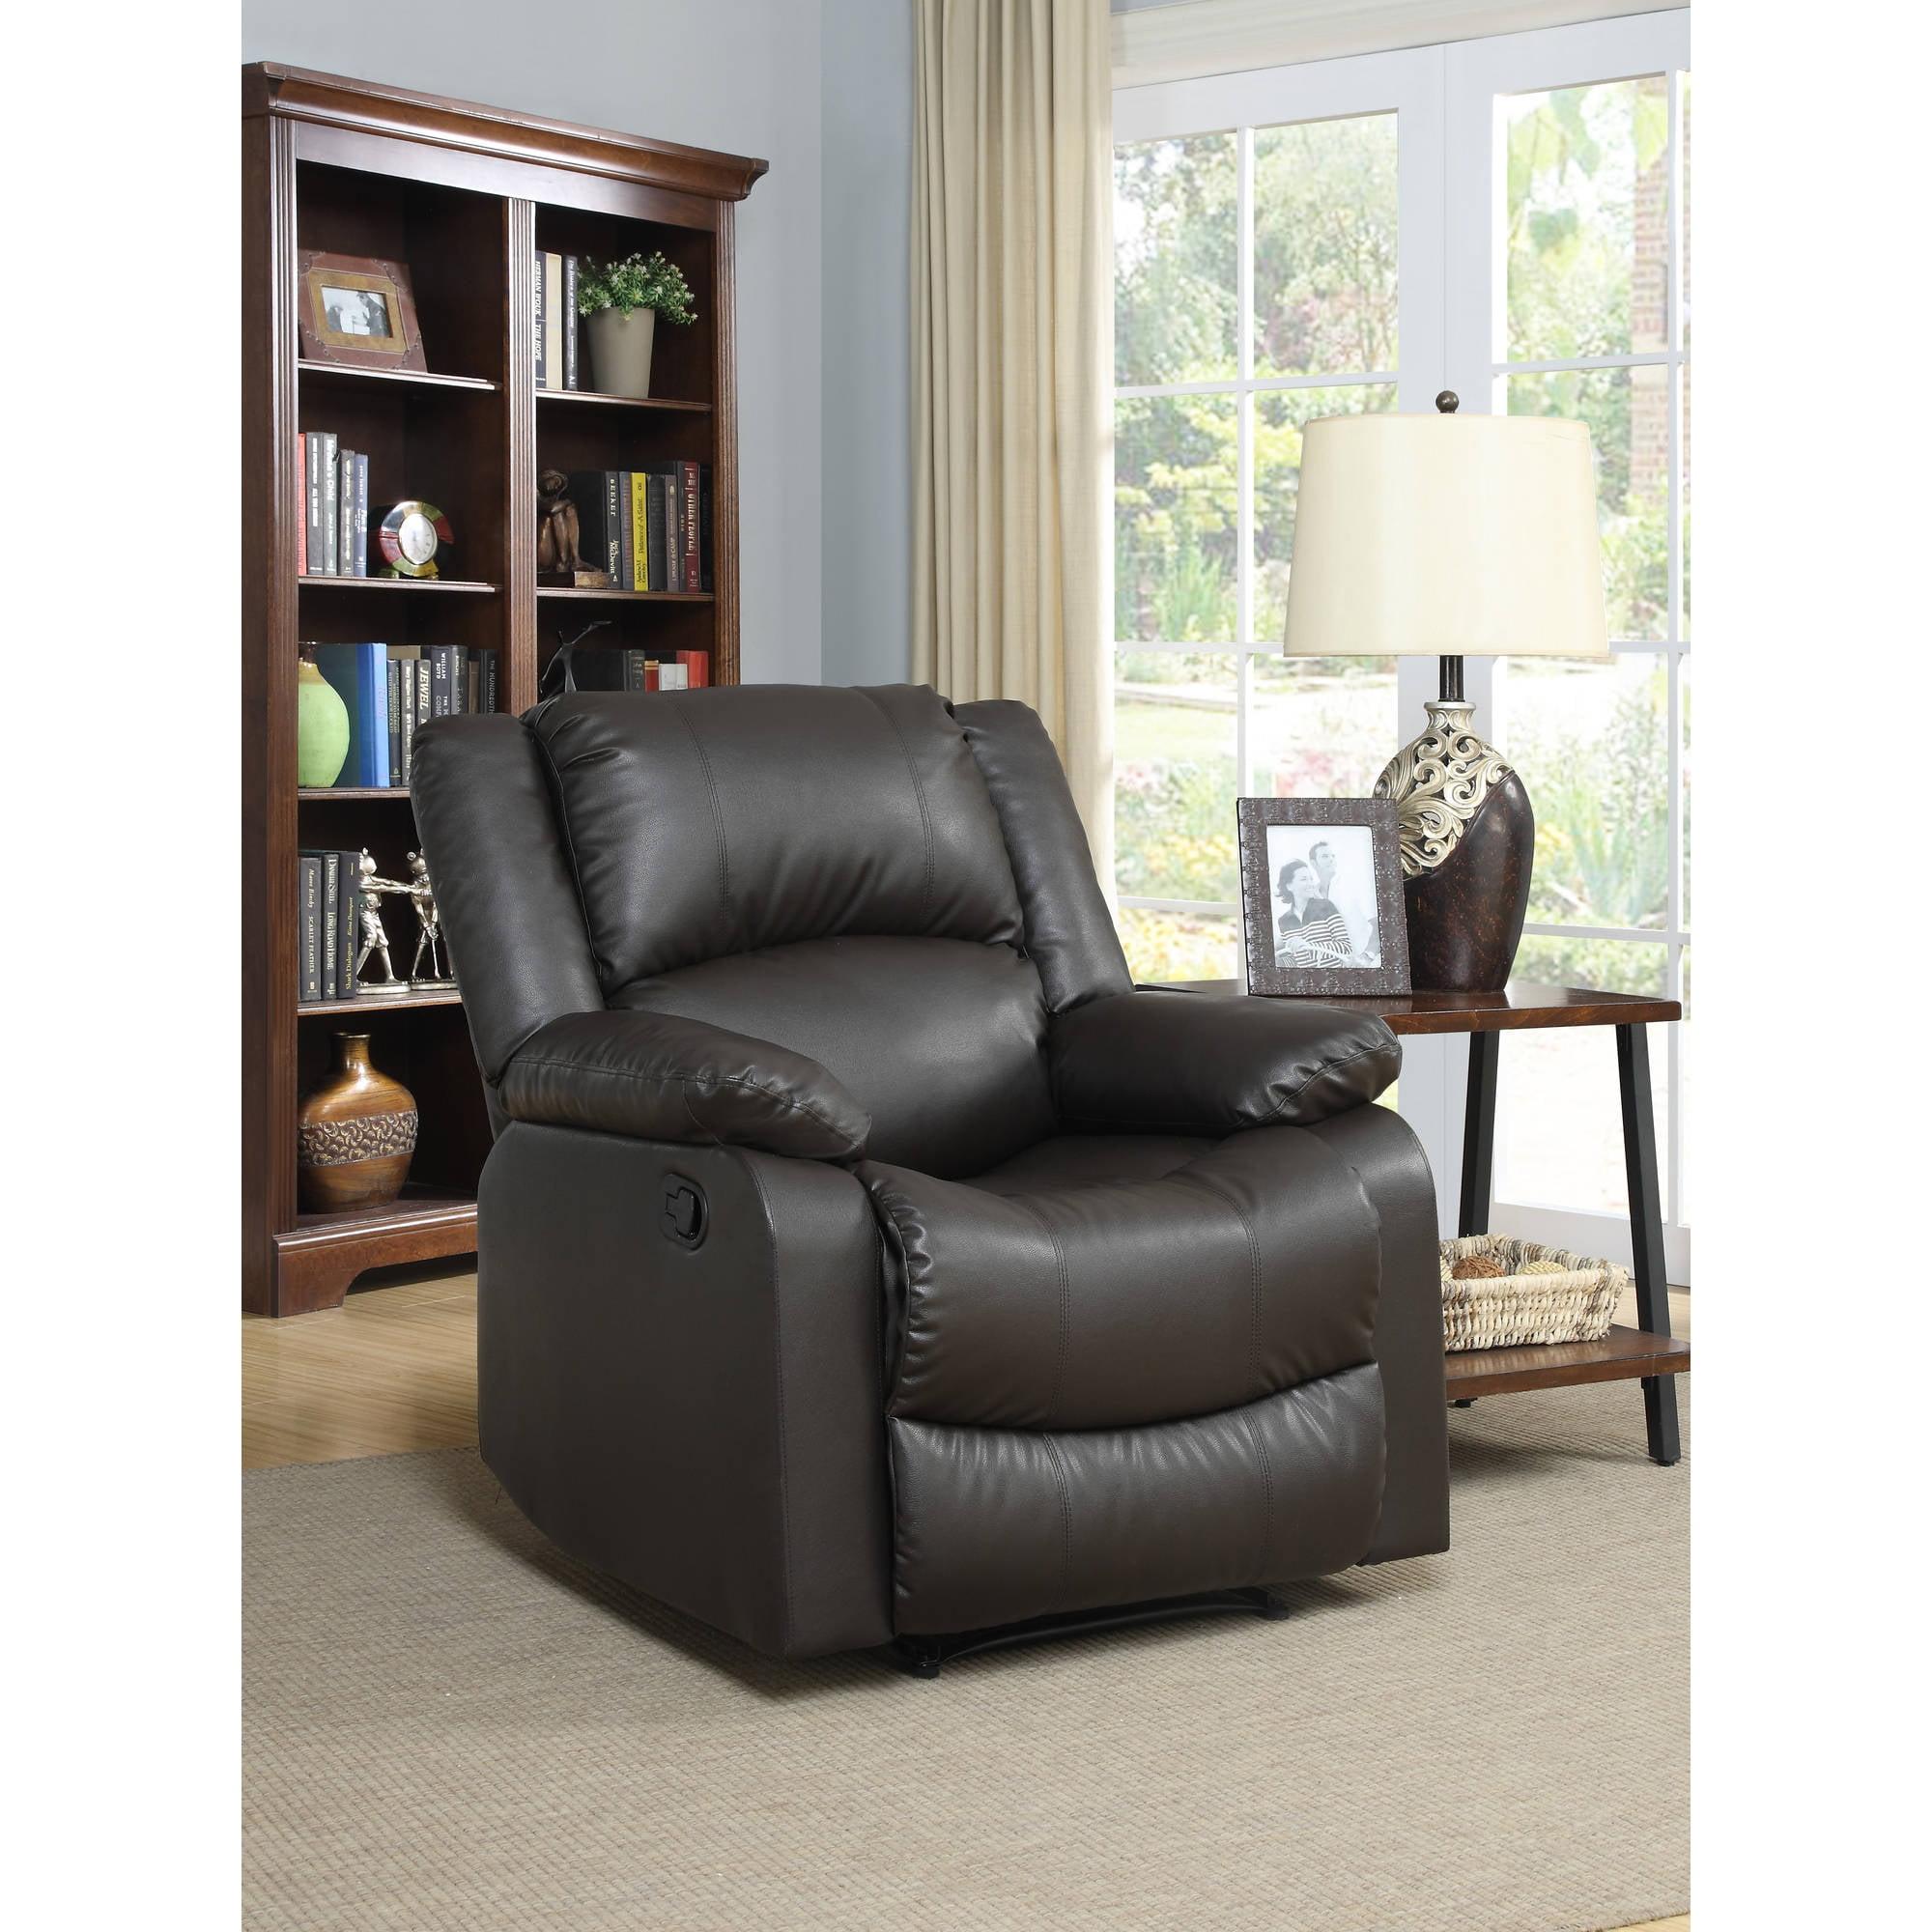 Warren Recliner Single Chair in Java Leather